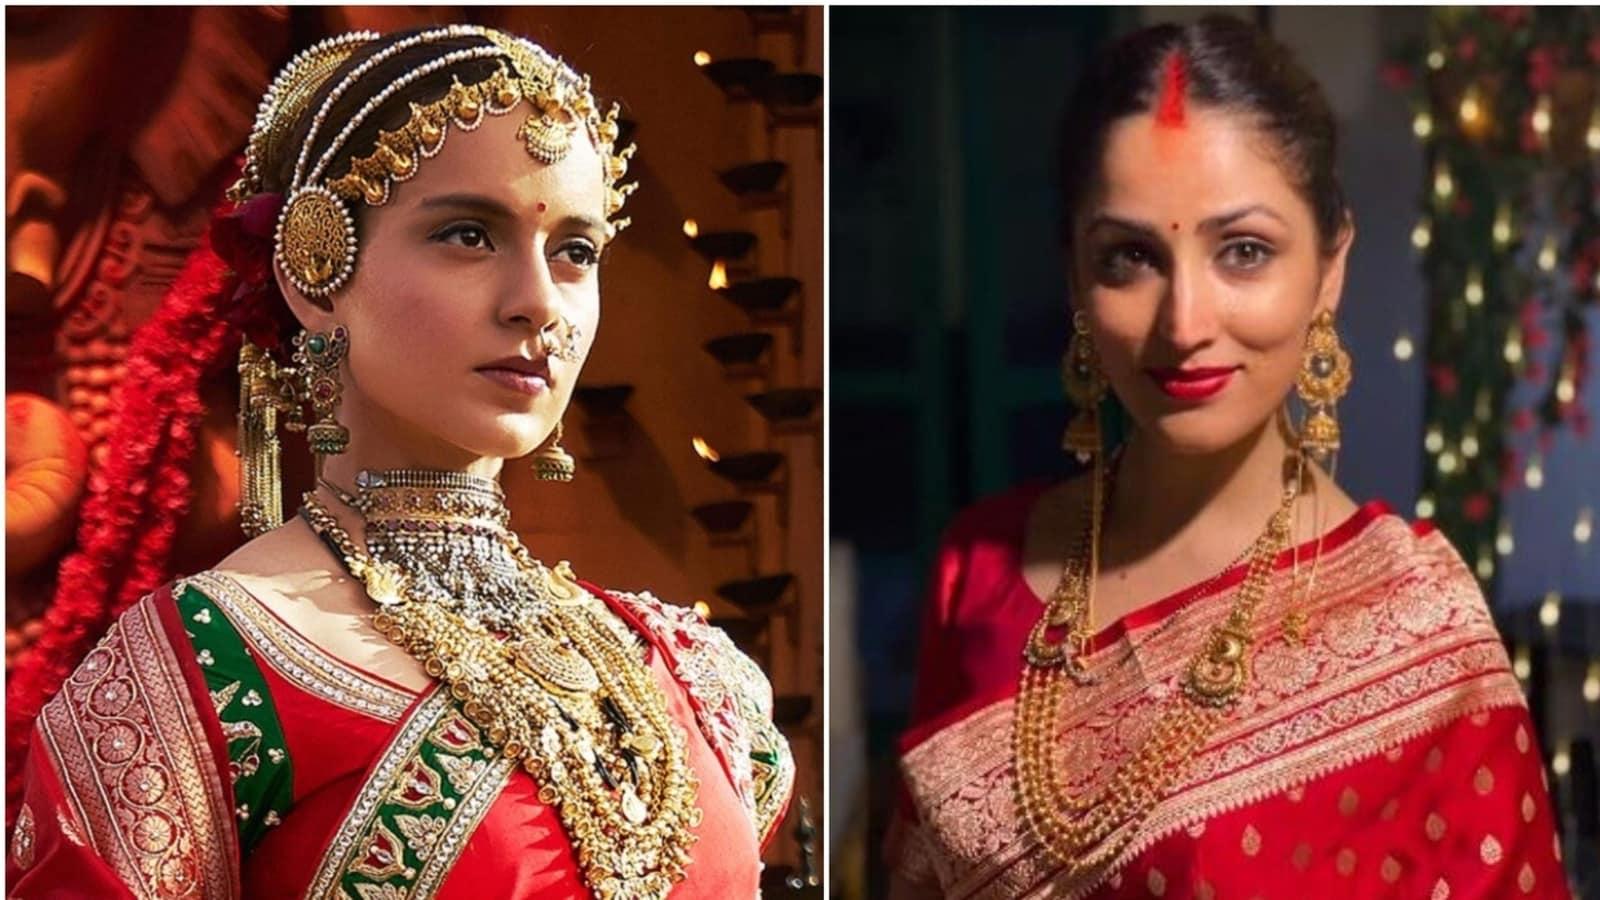 Kangana Ranaut hijacks Yami Gautam's wedding post, responds to Ayushmann Khurrana's comment - Hindustan Times thumbnail